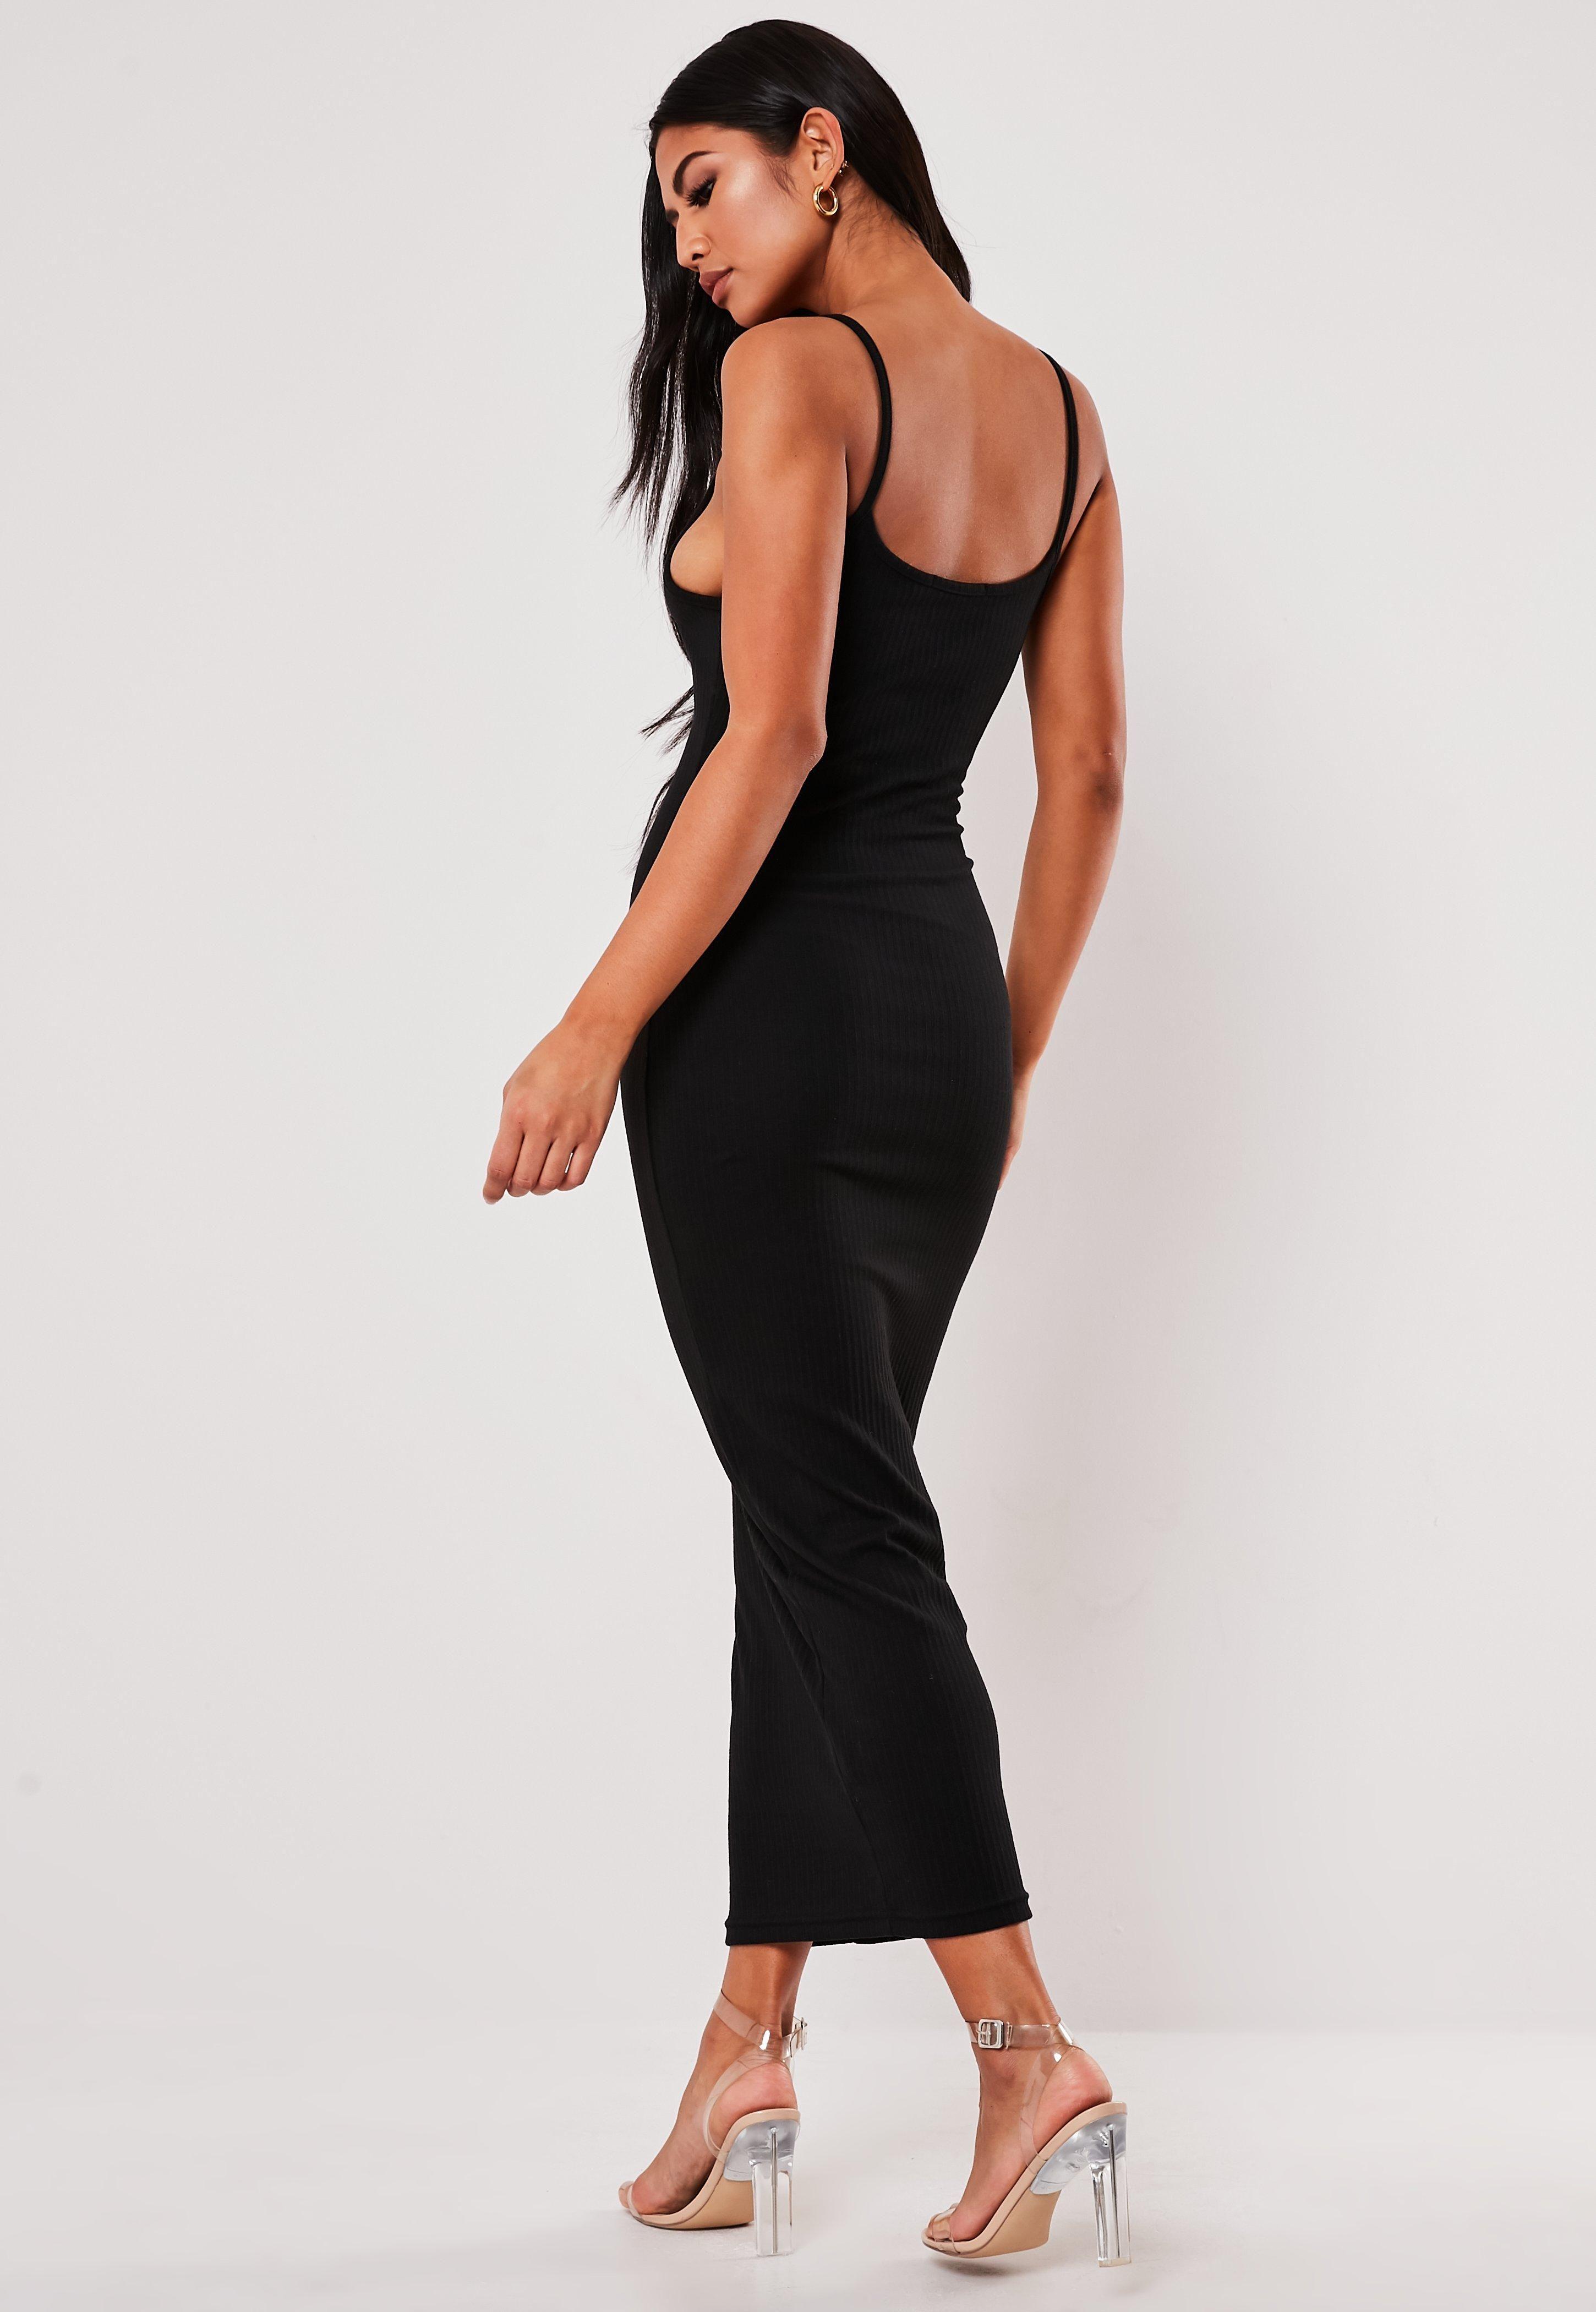 Missguided Black Ribbed Strappy Bodycon Midi Dress Midi Dress Bodycon Bodycon Fashion Strappy Midi Dress [ 4200 x 2900 Pixel ]